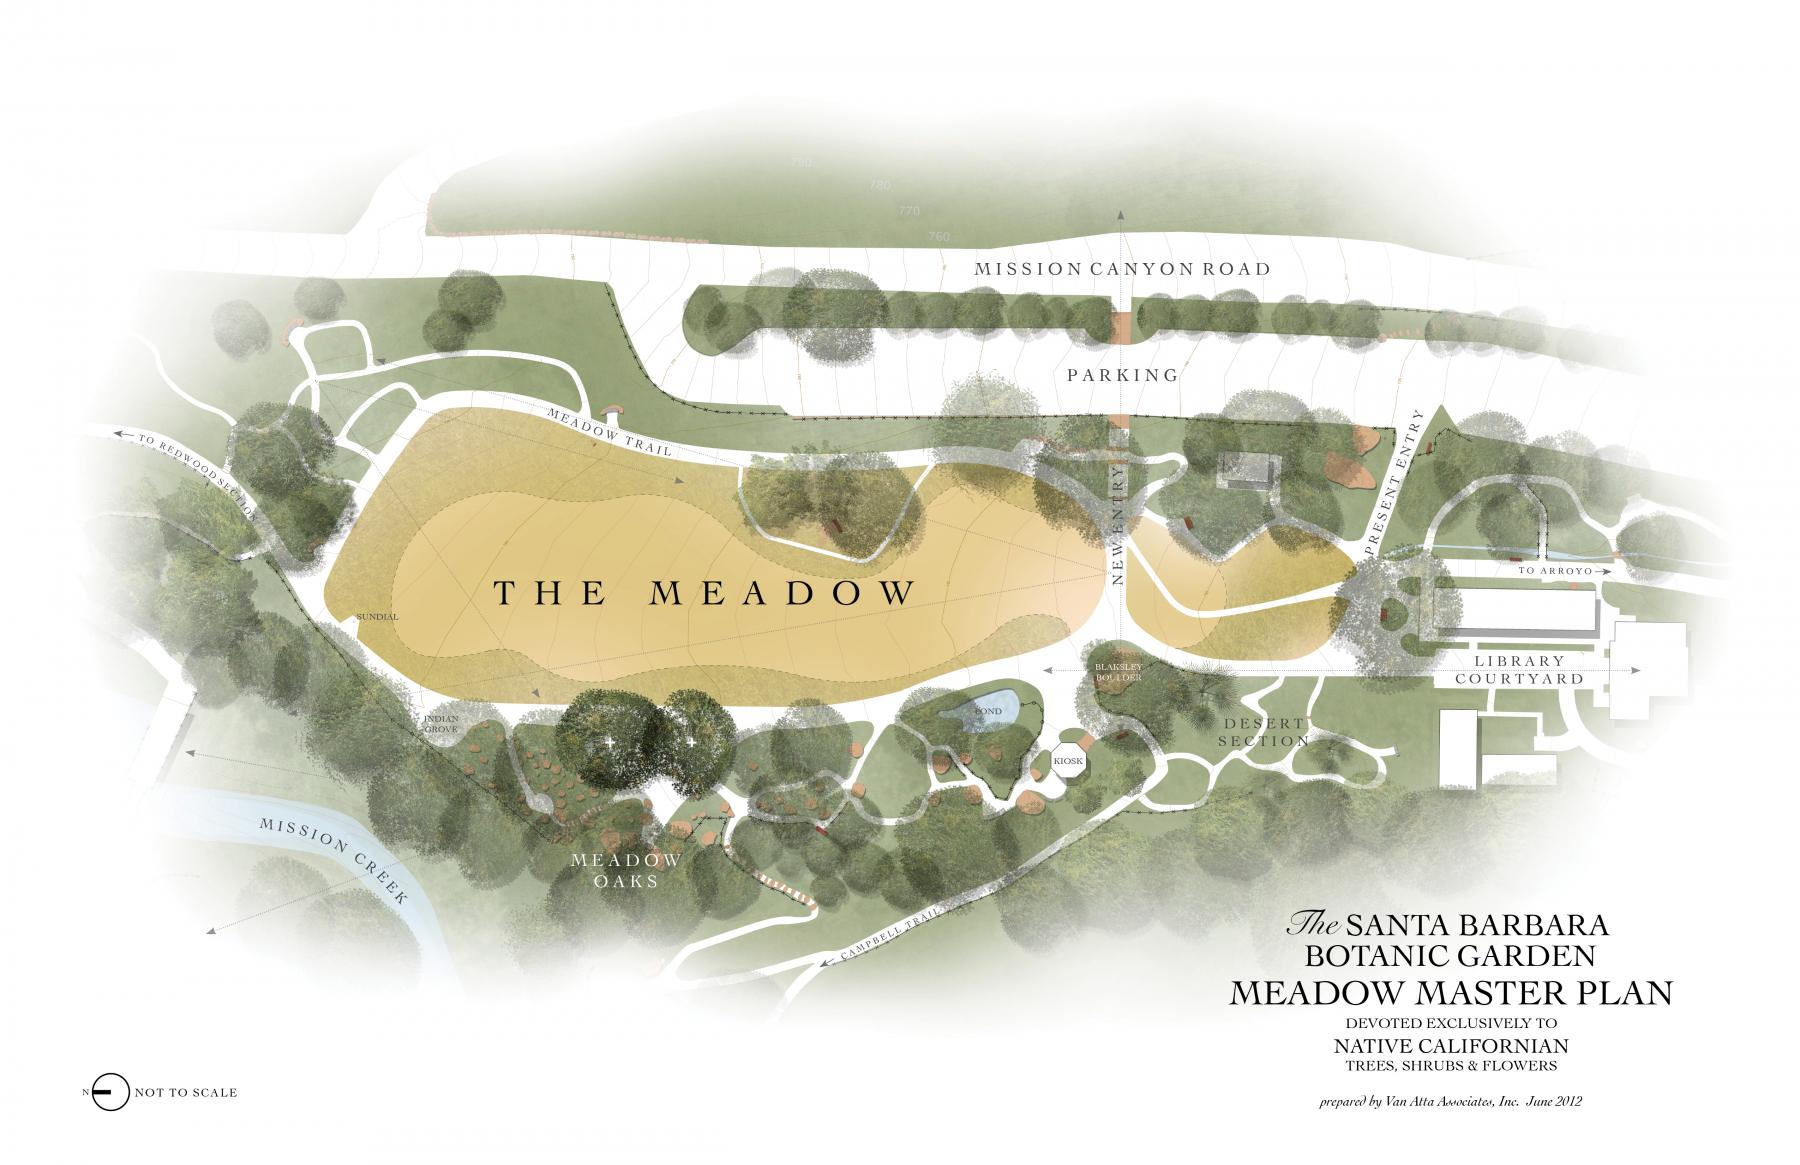 Meadow-MP-11x17